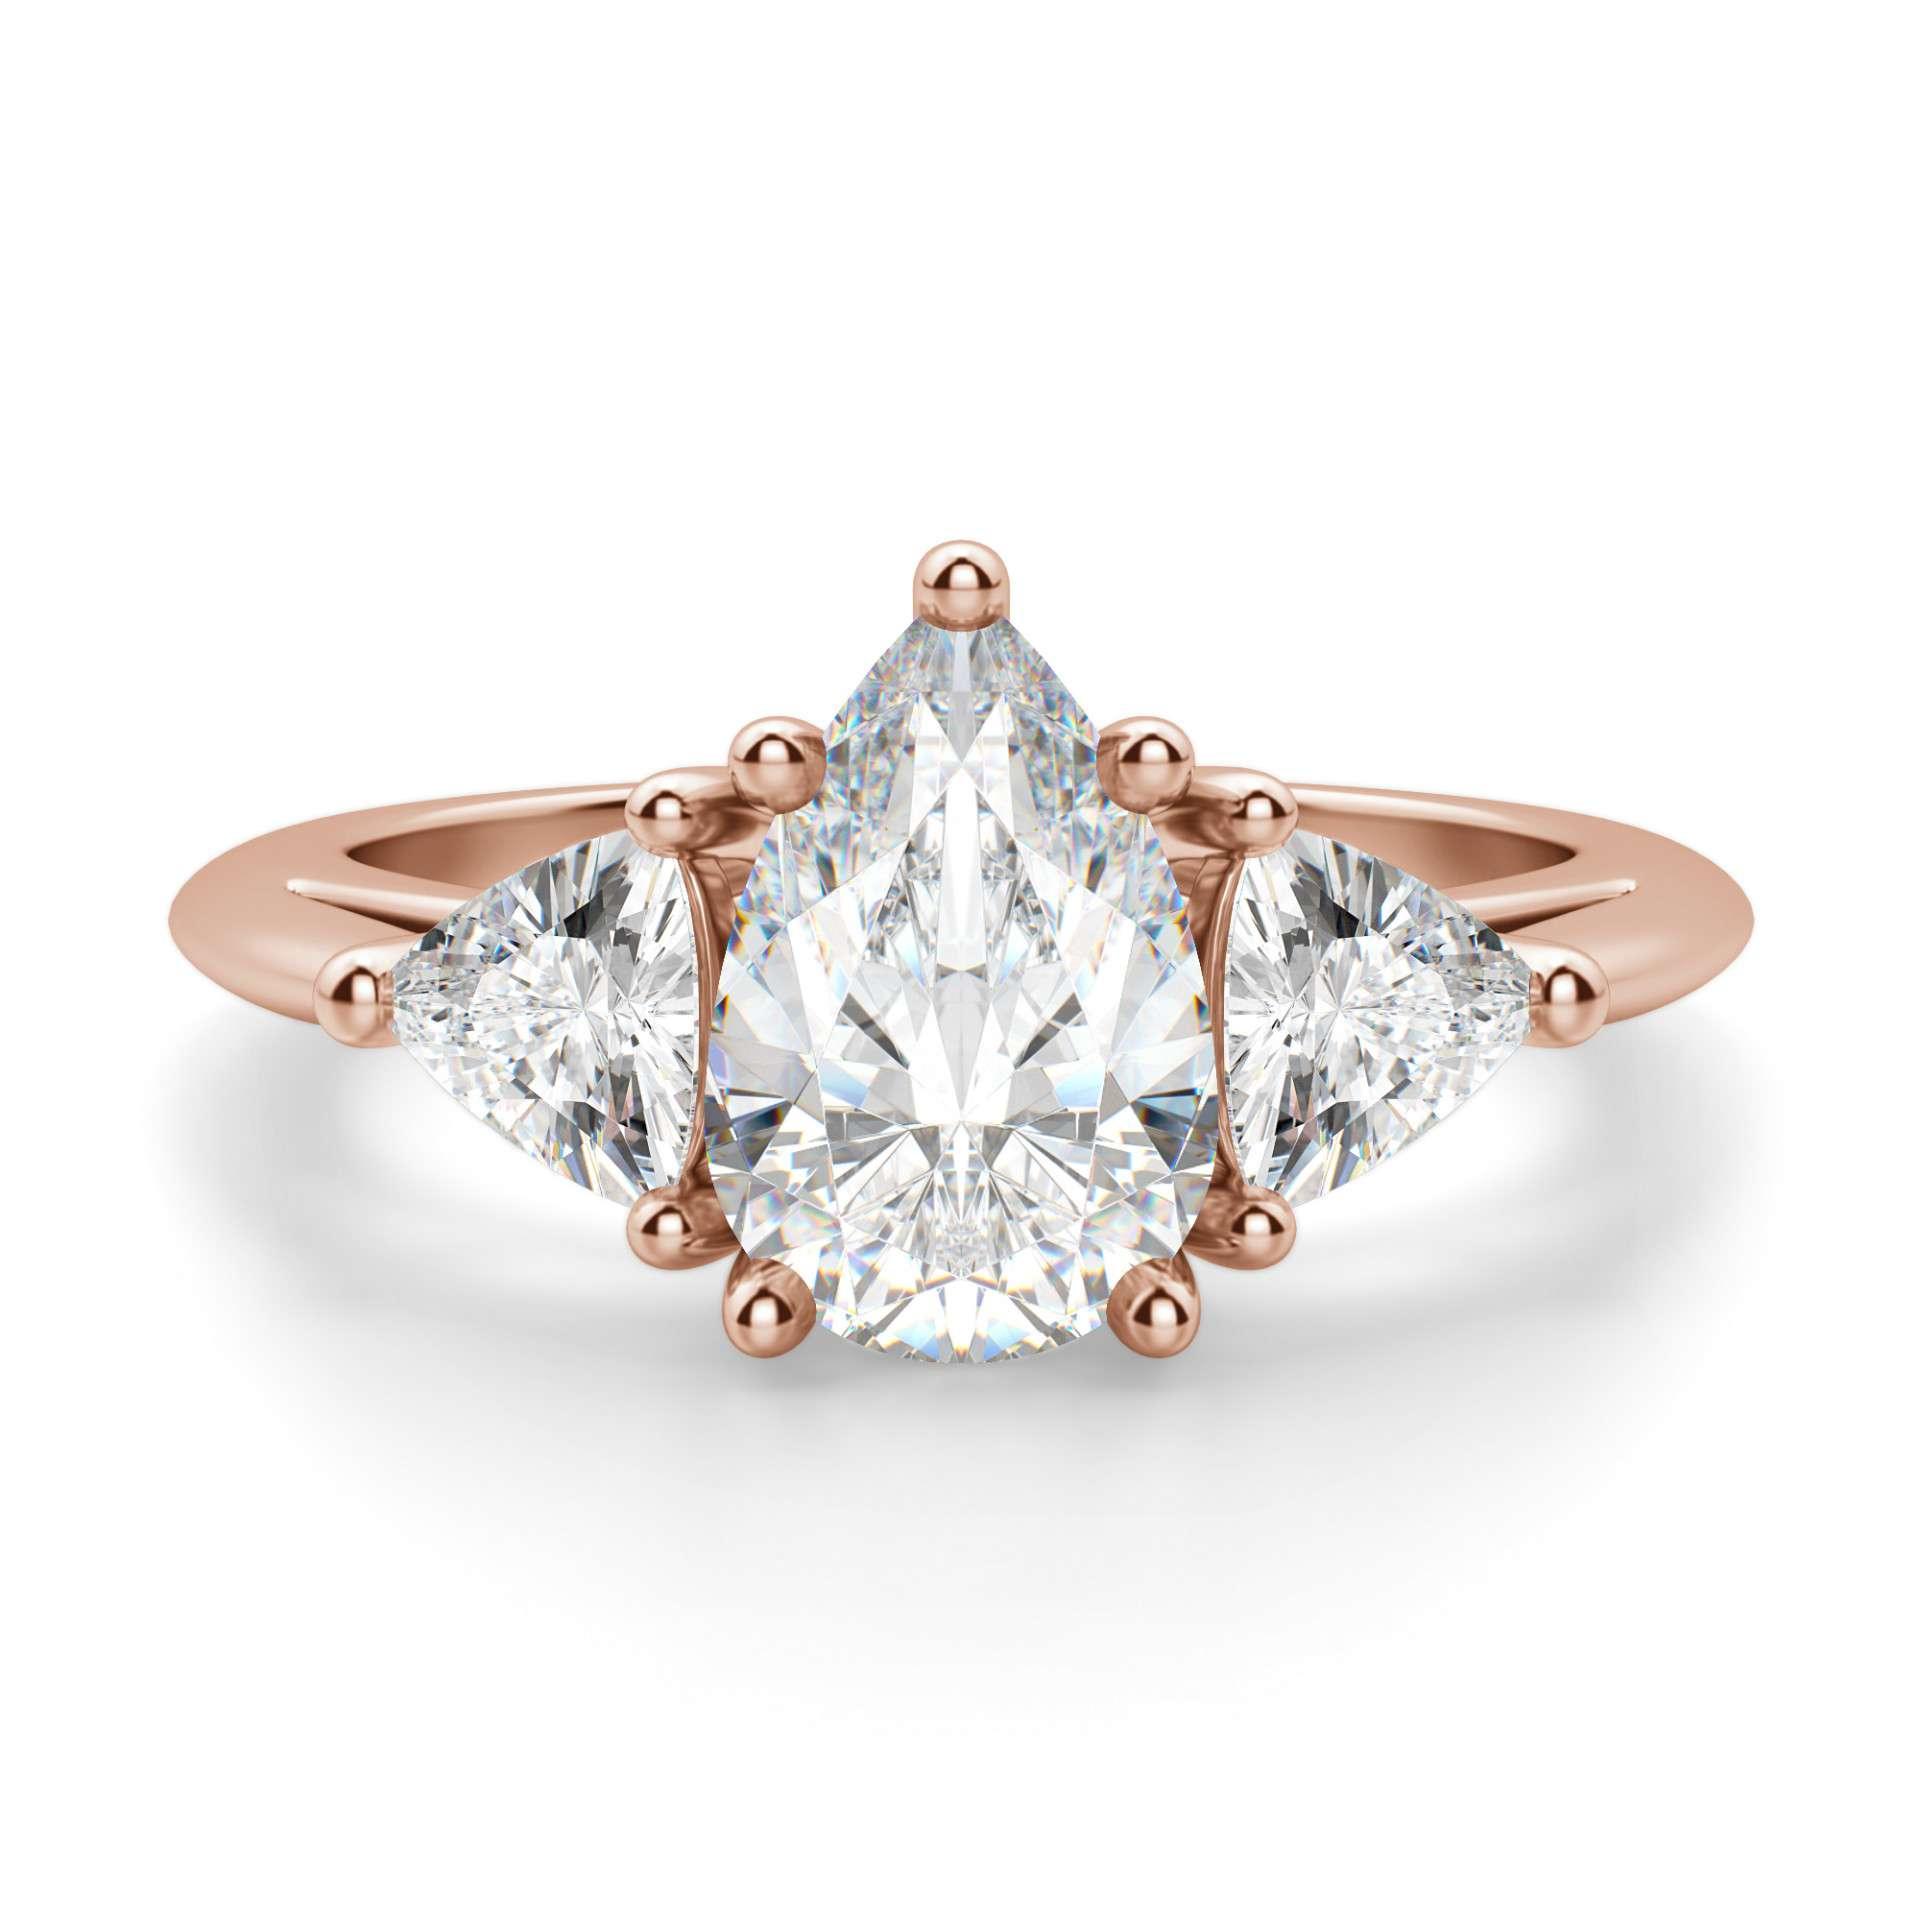 Diamond Nexus Timeless Pear Cut Engagement Ring